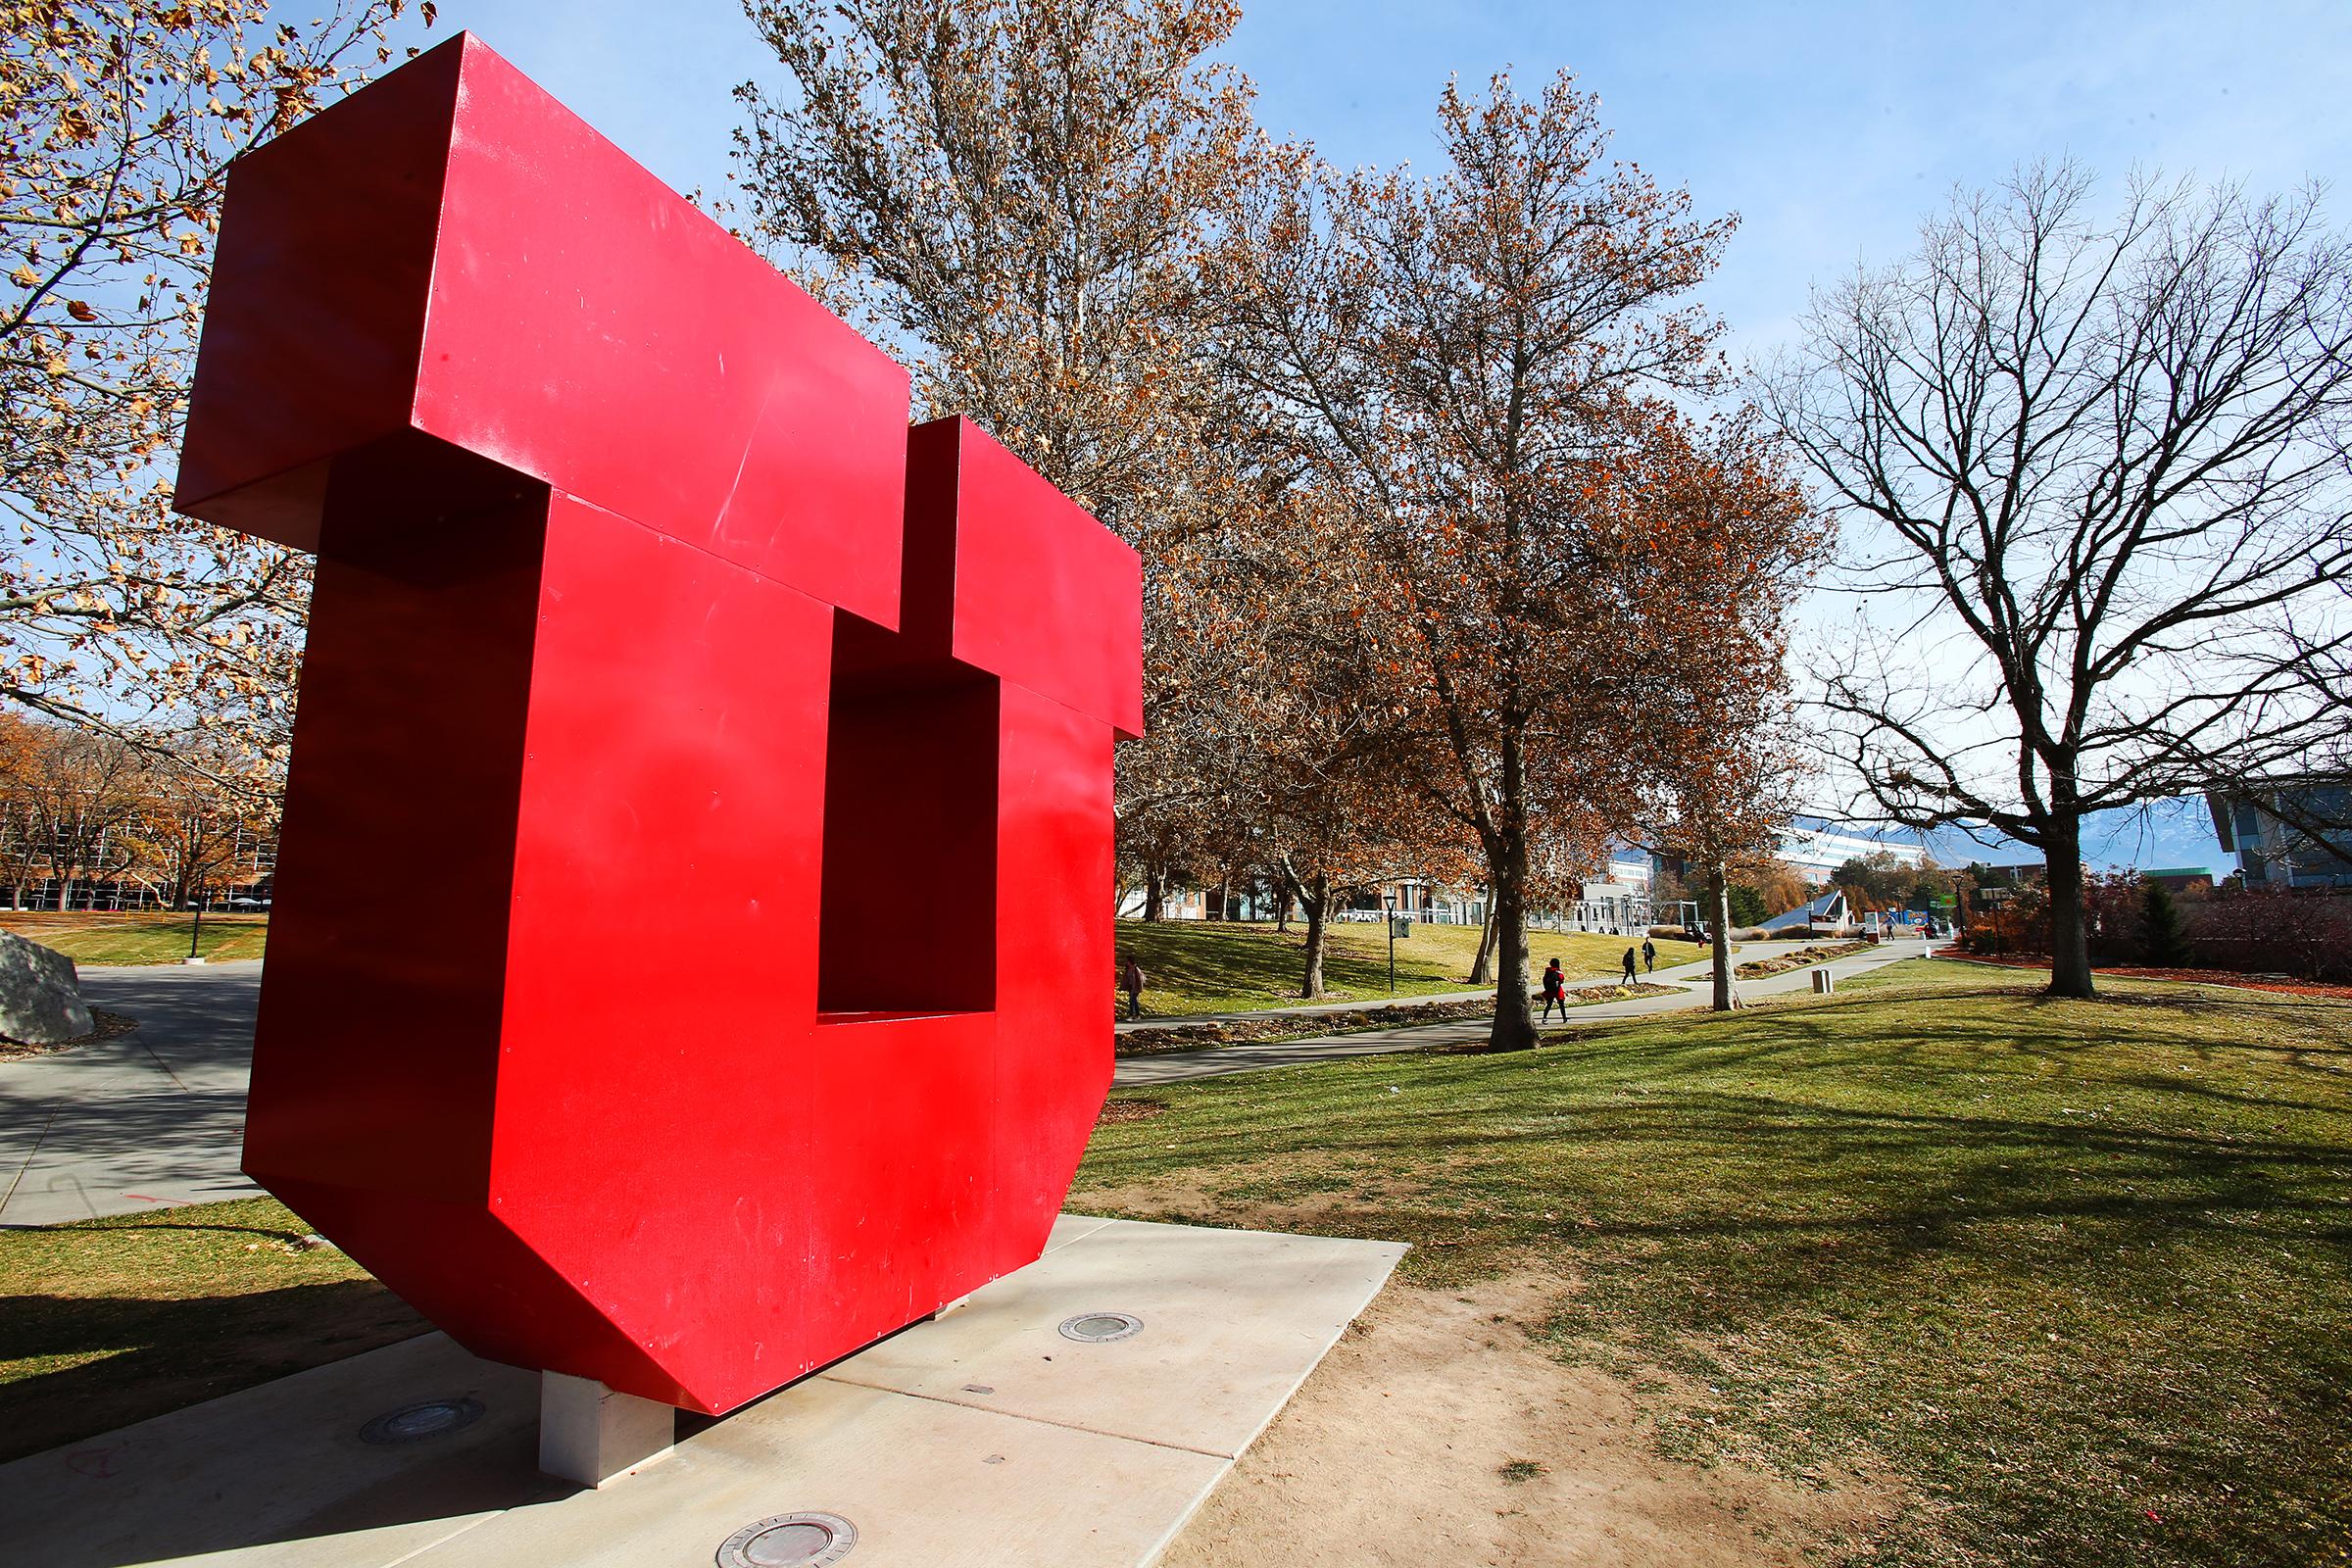 University of Utah in Salt Lake City on Monday, Nov. 18, 2019.